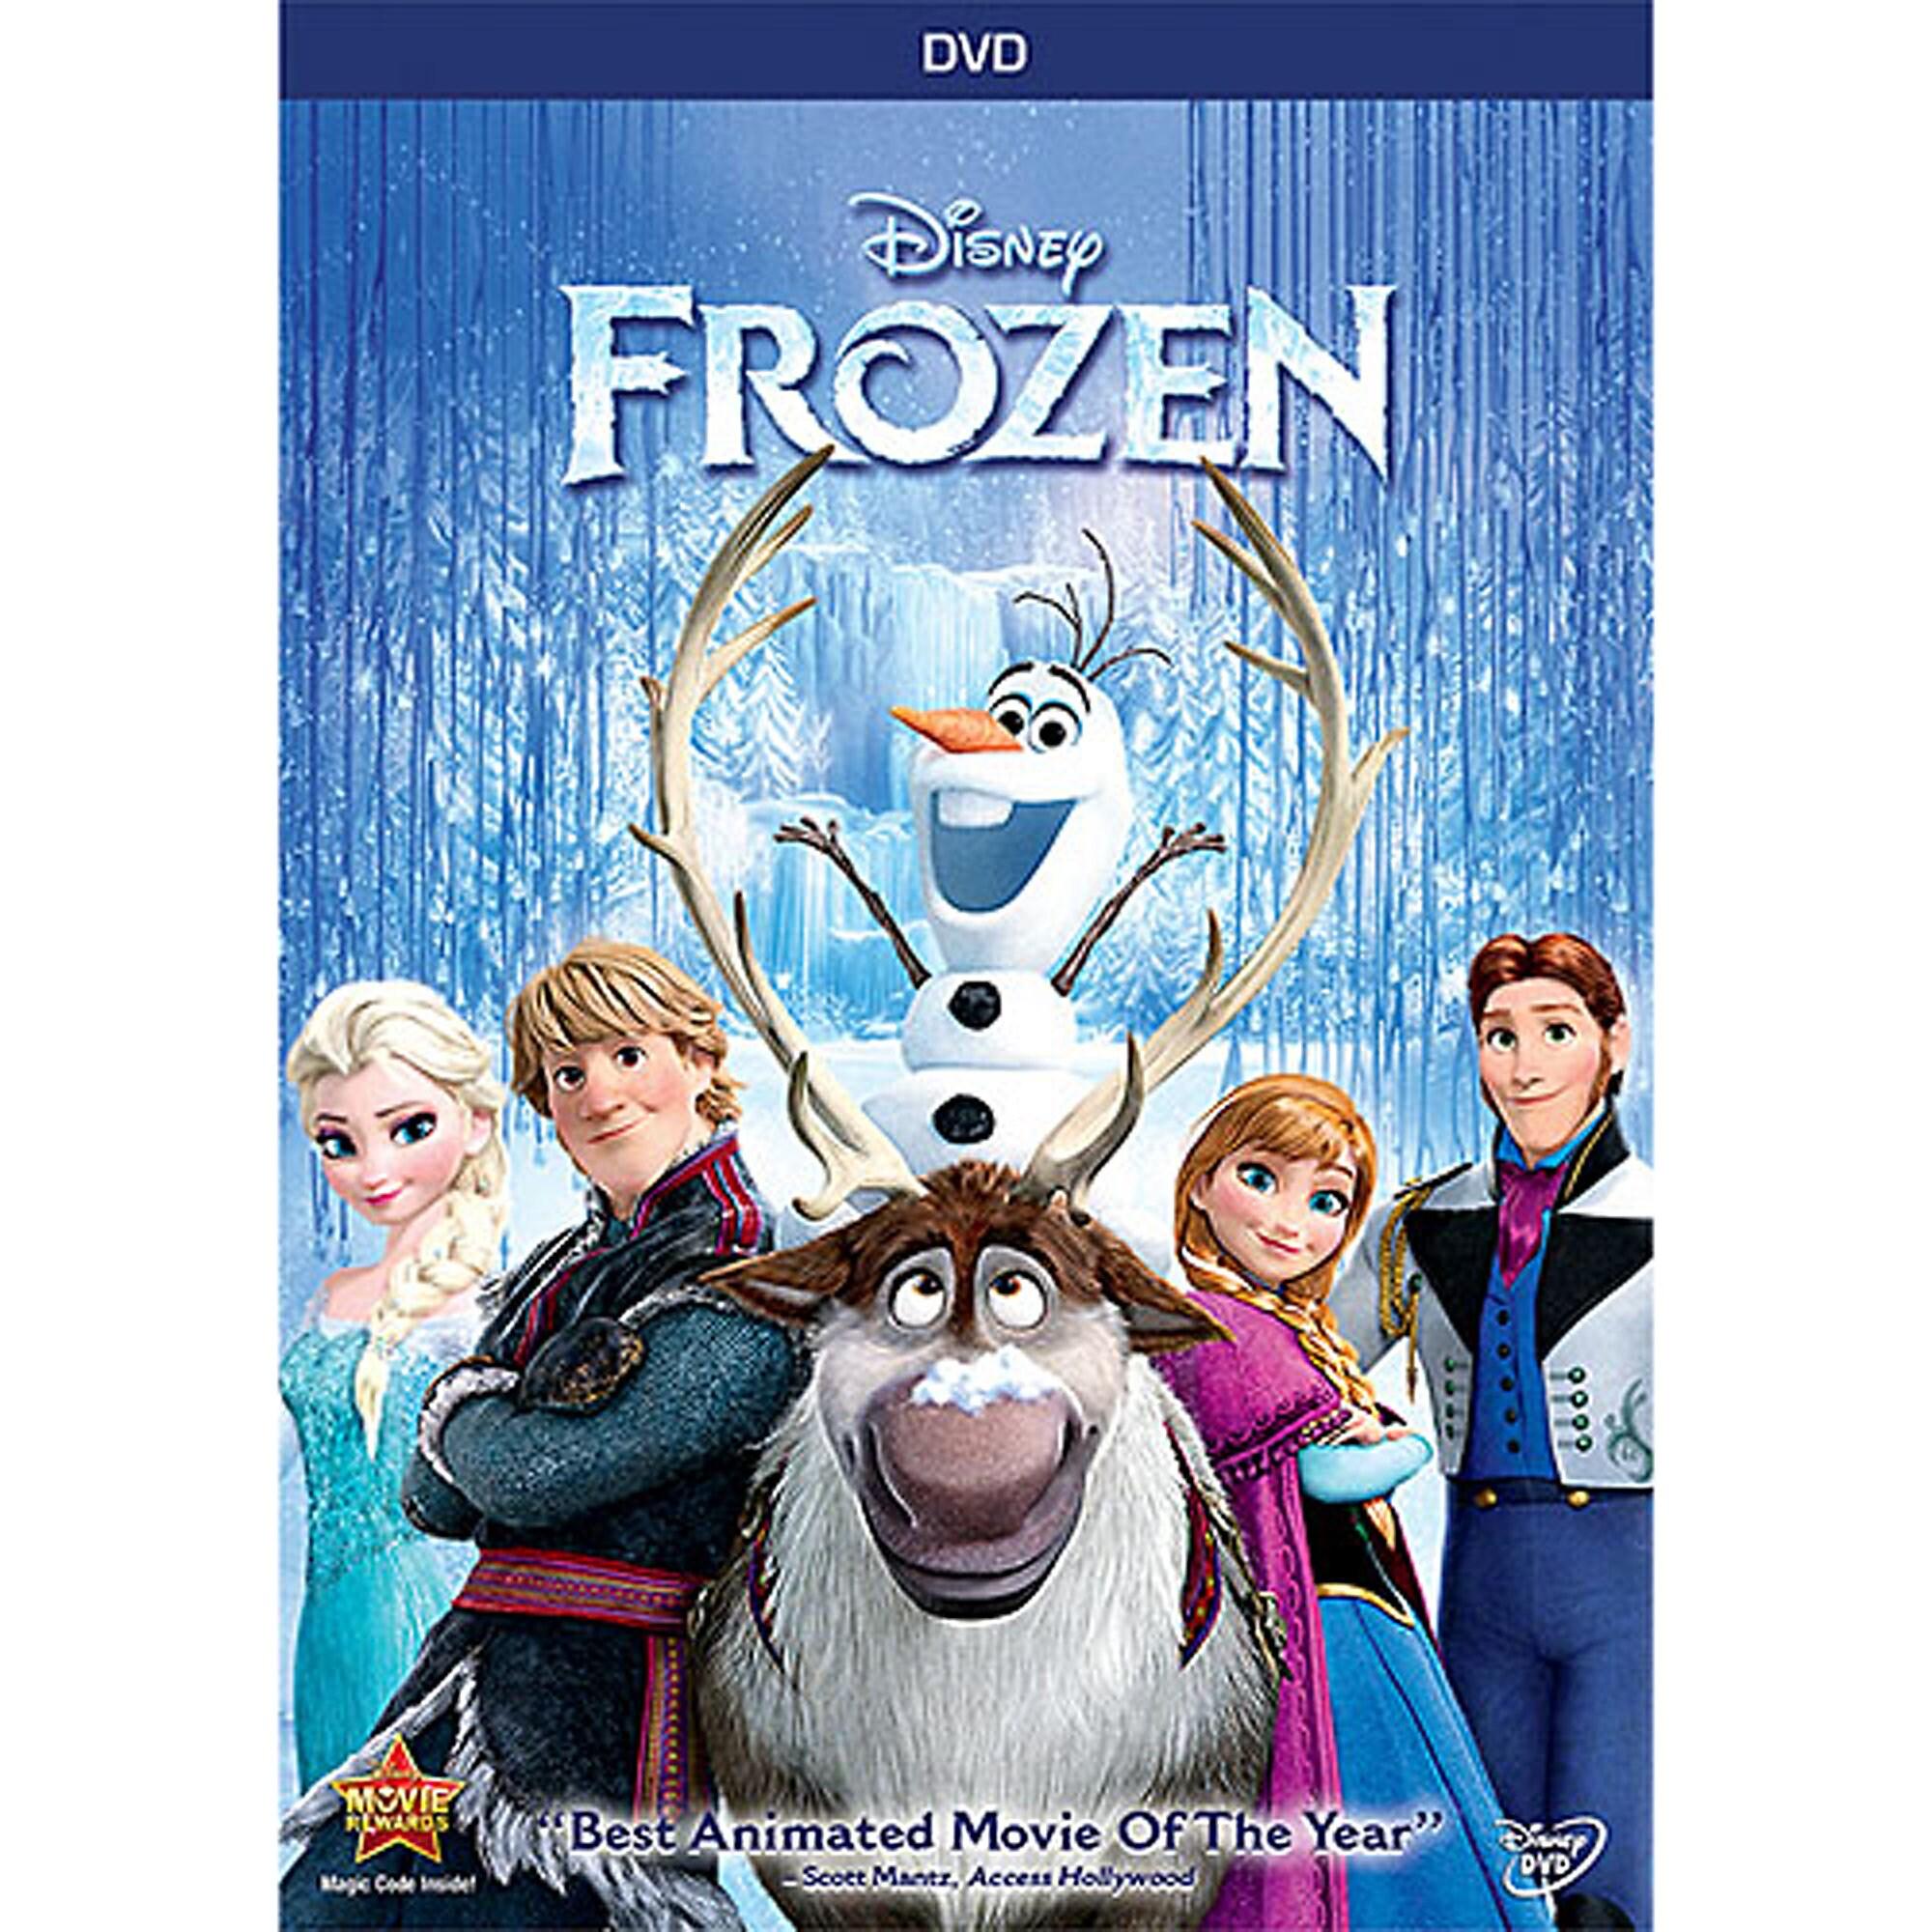 Frozen DVD